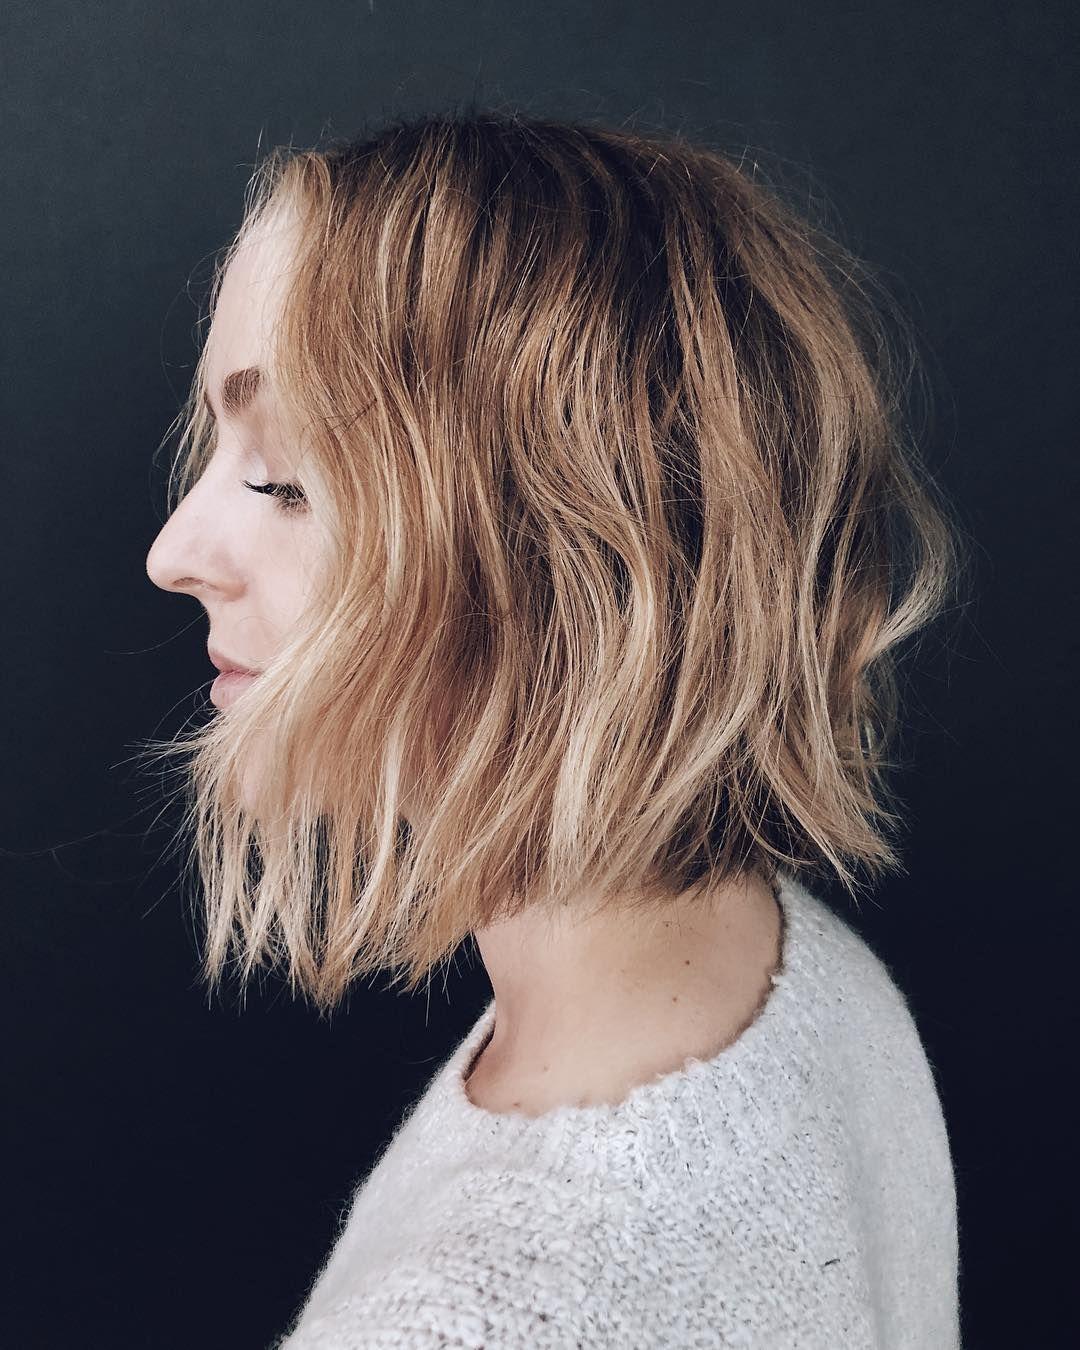 Kristin Ess Hair Founder On Instagram Monday Mood Air Dry Goals Starring Norawyman Doless Kinderfrisuren Kinderfrisuren Flechten Trendfrisuren